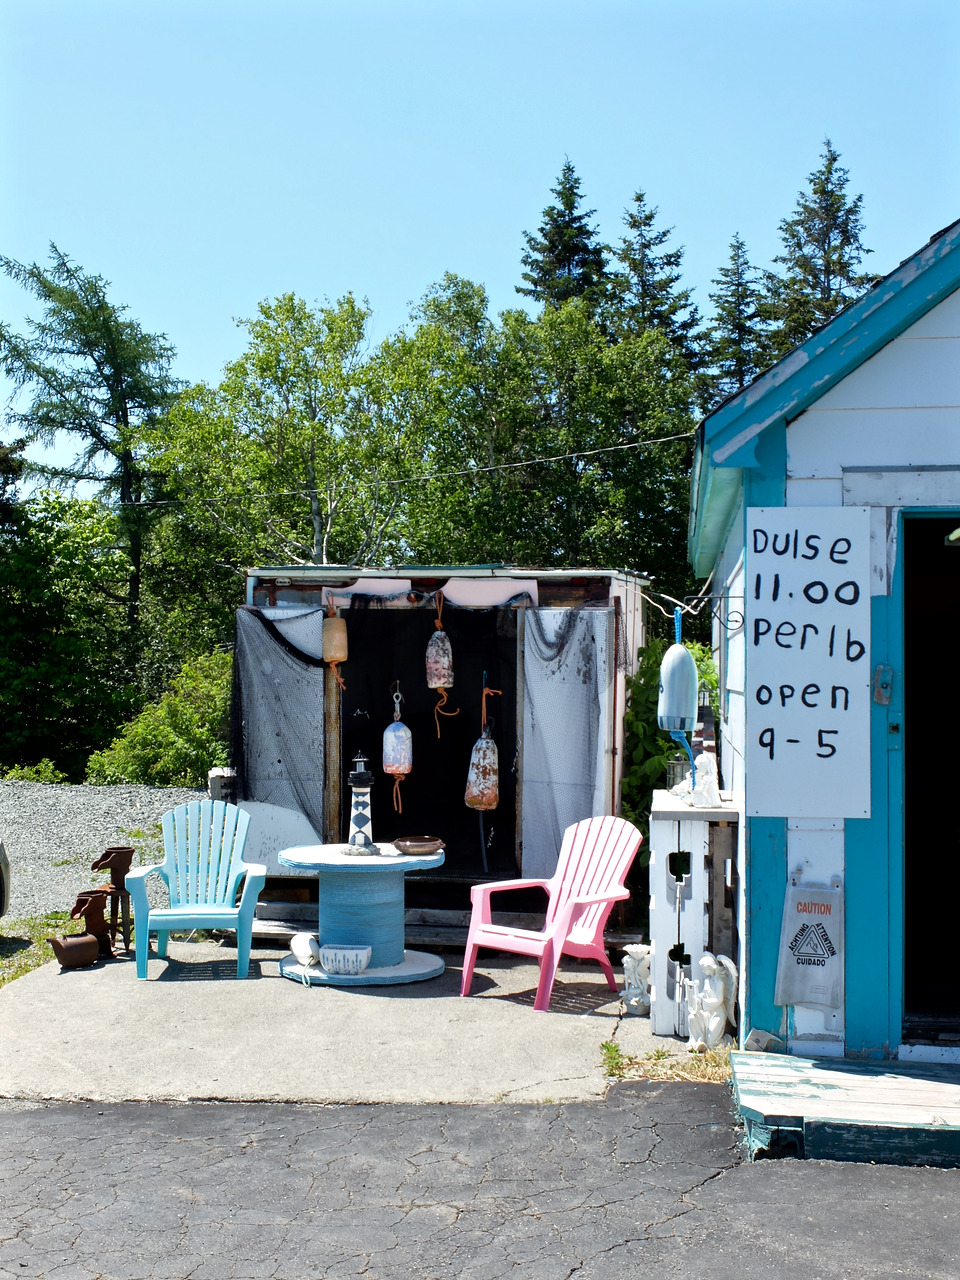 mangia minga // Travels: Grand Manan, New Brunswick. At Marathon Inn